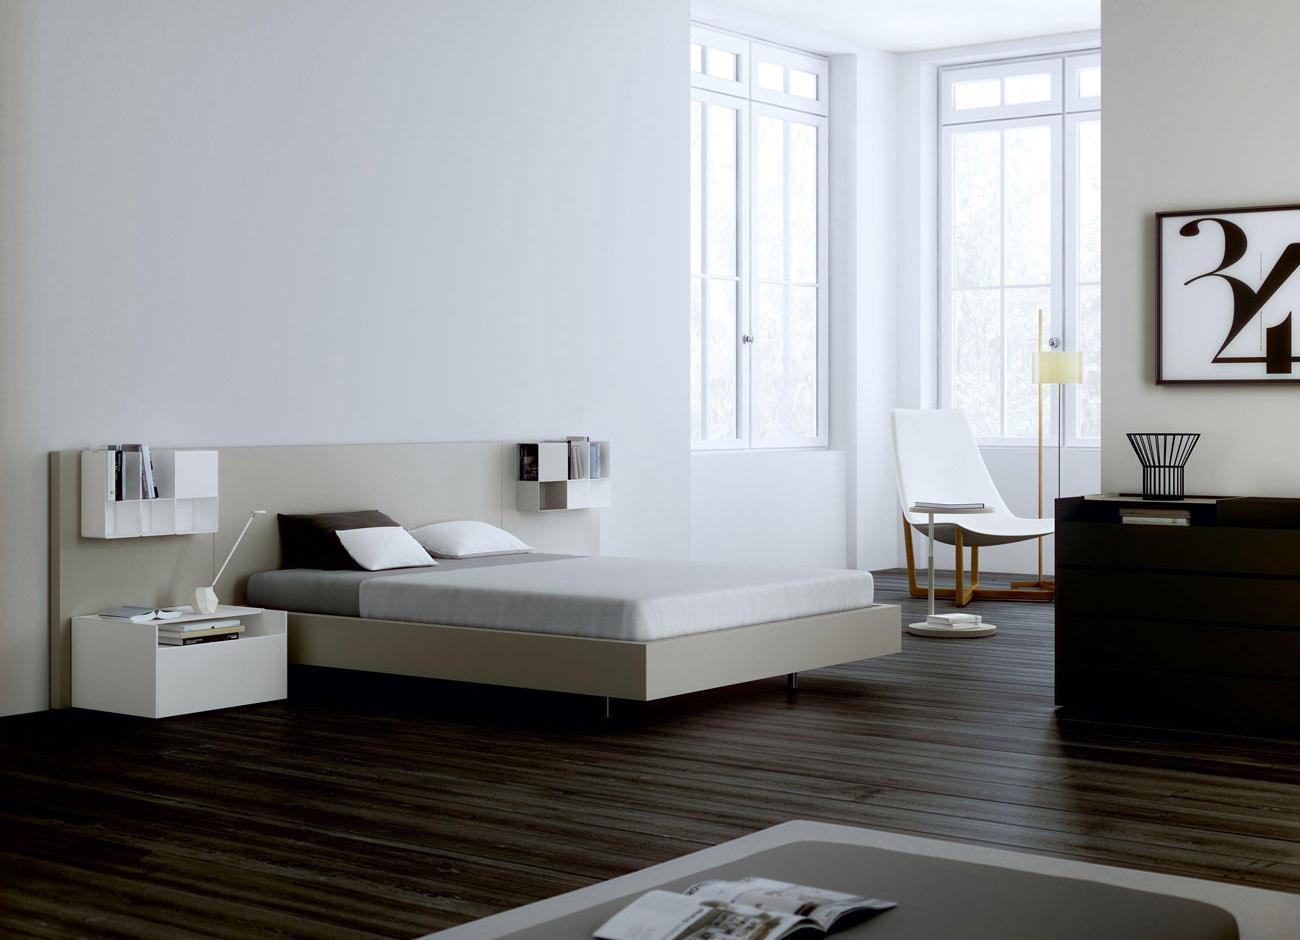 INDIGO BEDSIDE TABLE - Comodini ARLEX design | Architonic